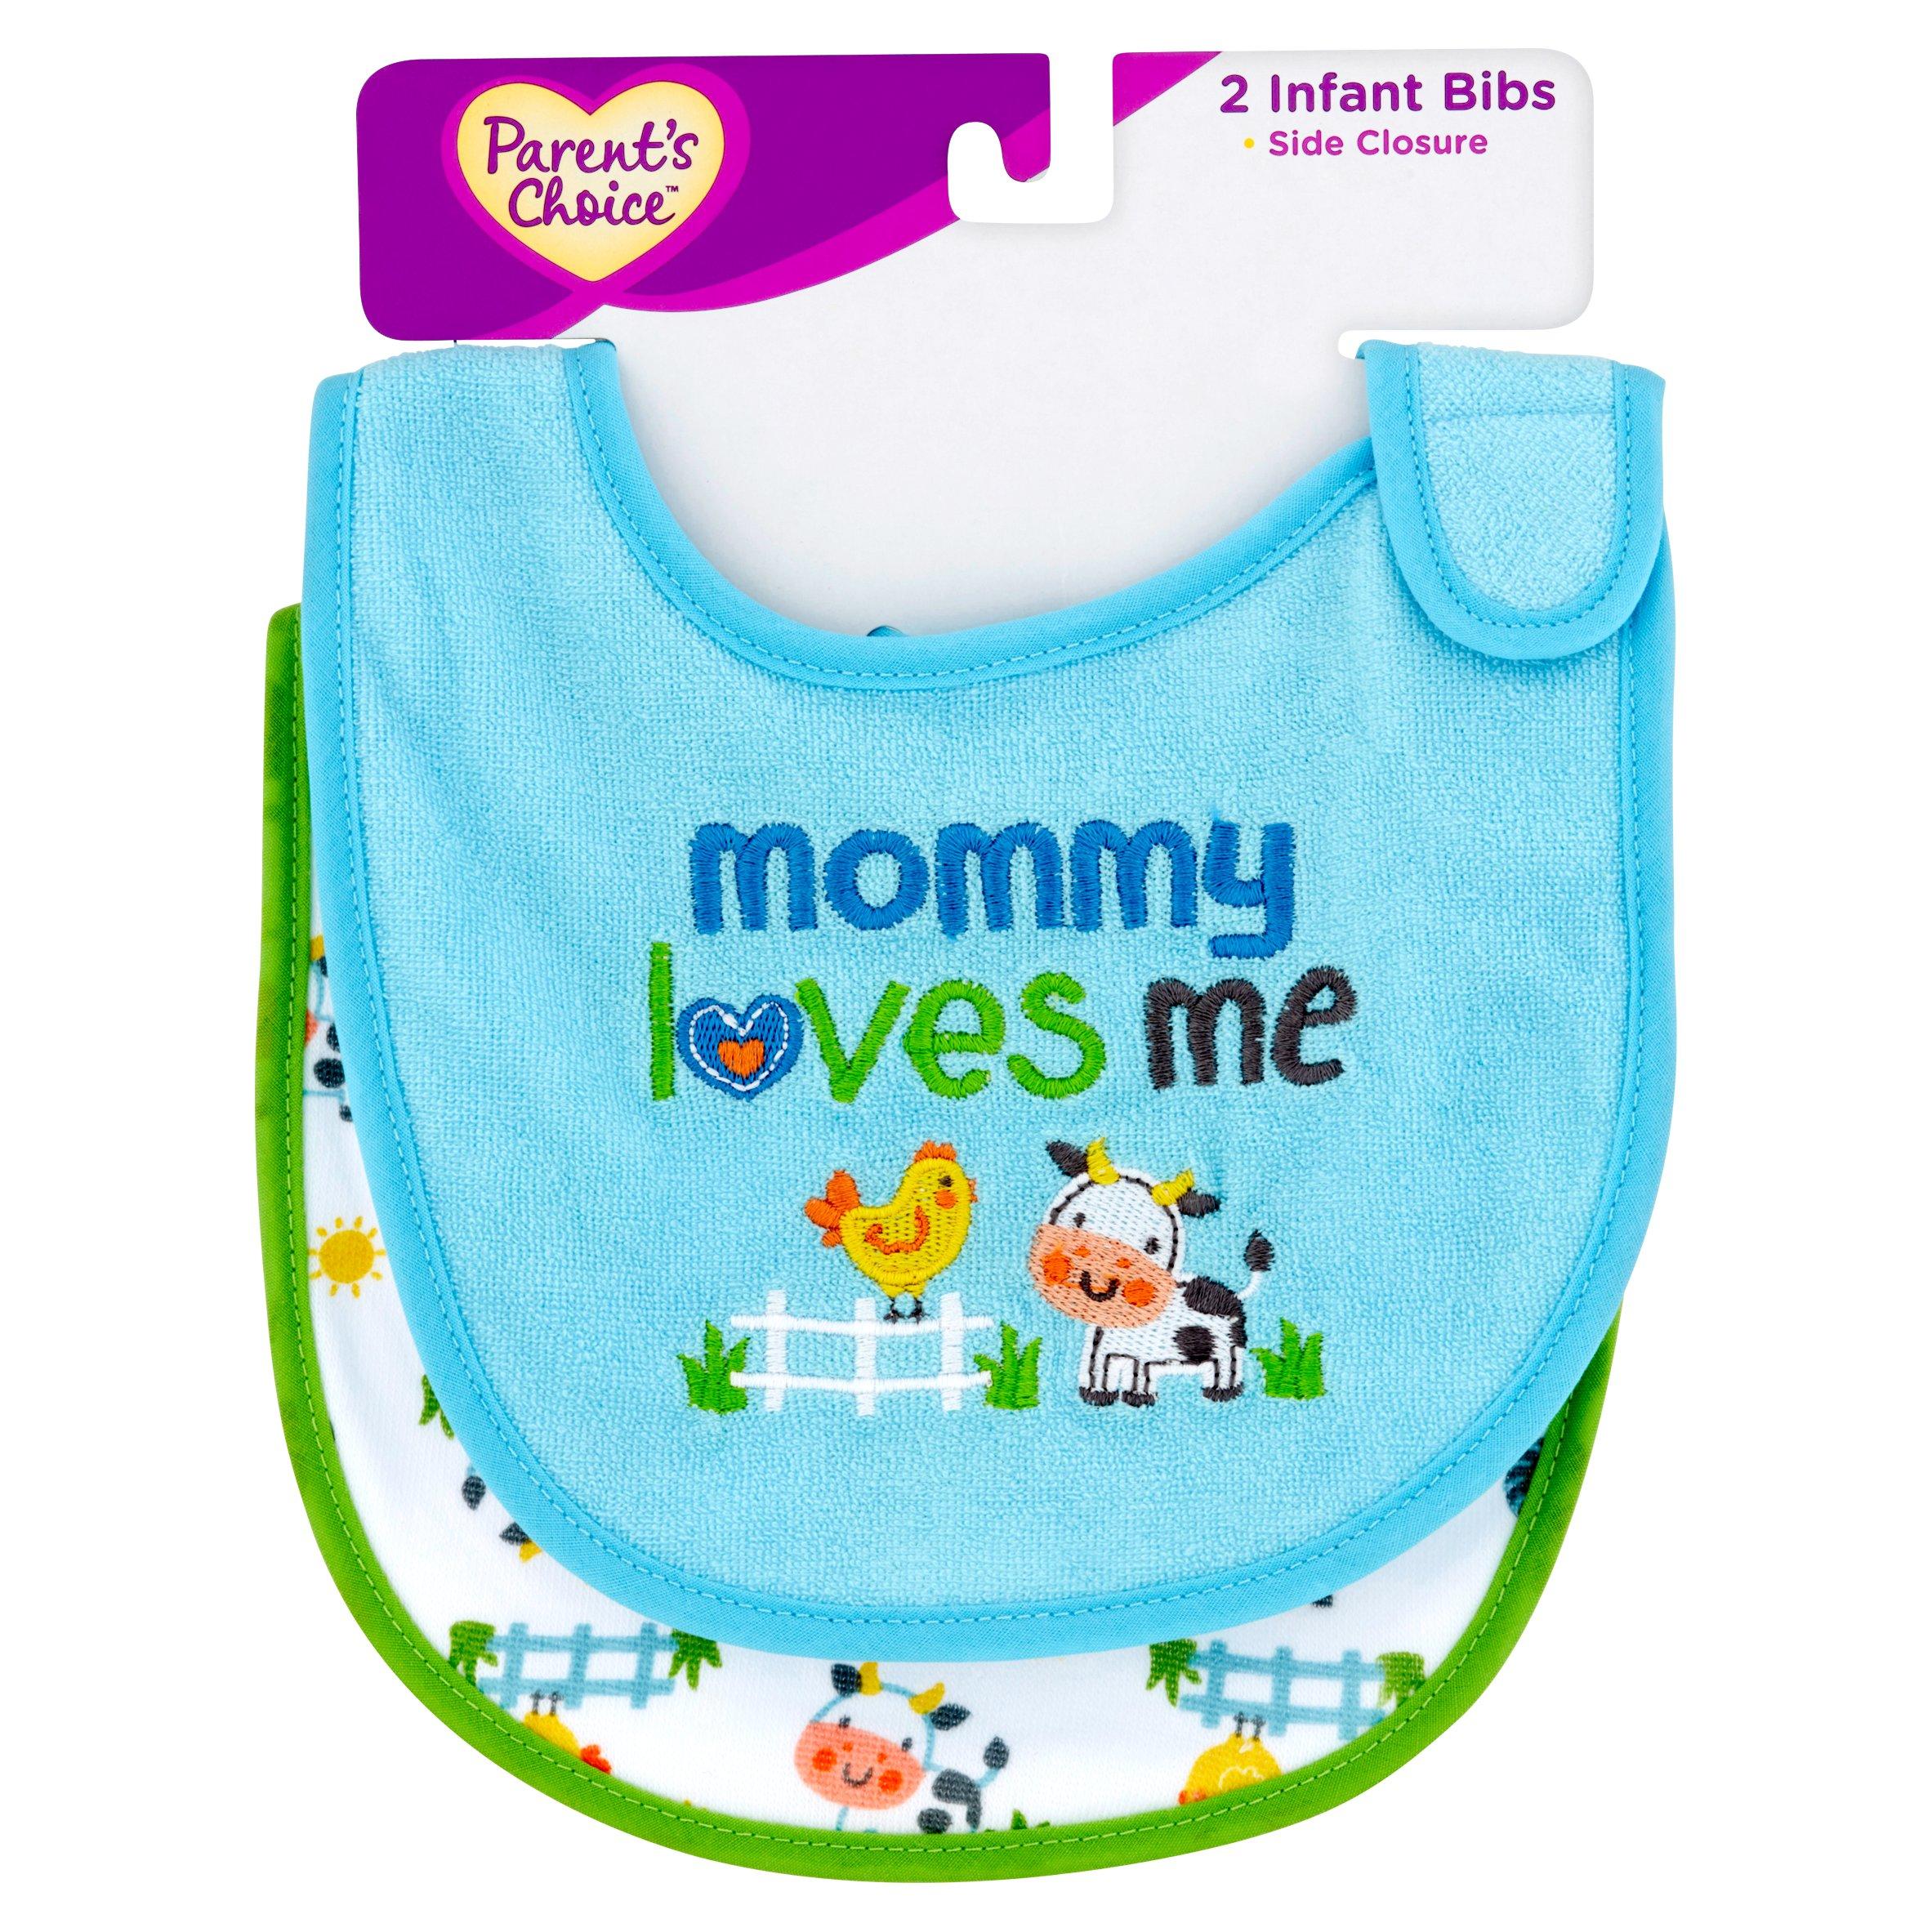 Parent's Choice Side Closure Infant Bibs, 2 pack